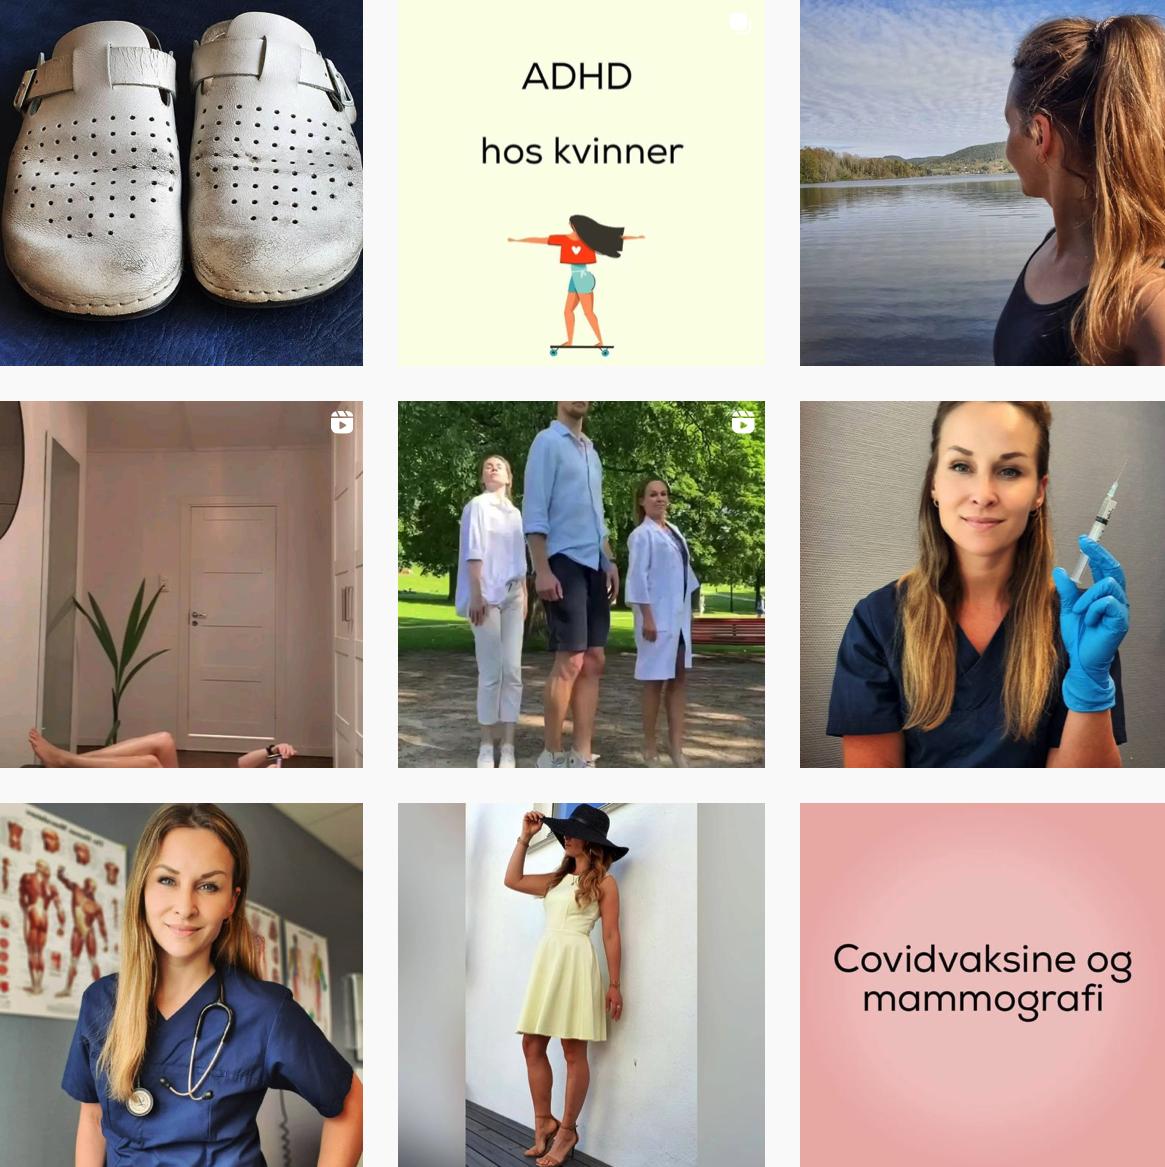 Katharina-Pracon-instagram-doktordamen-1